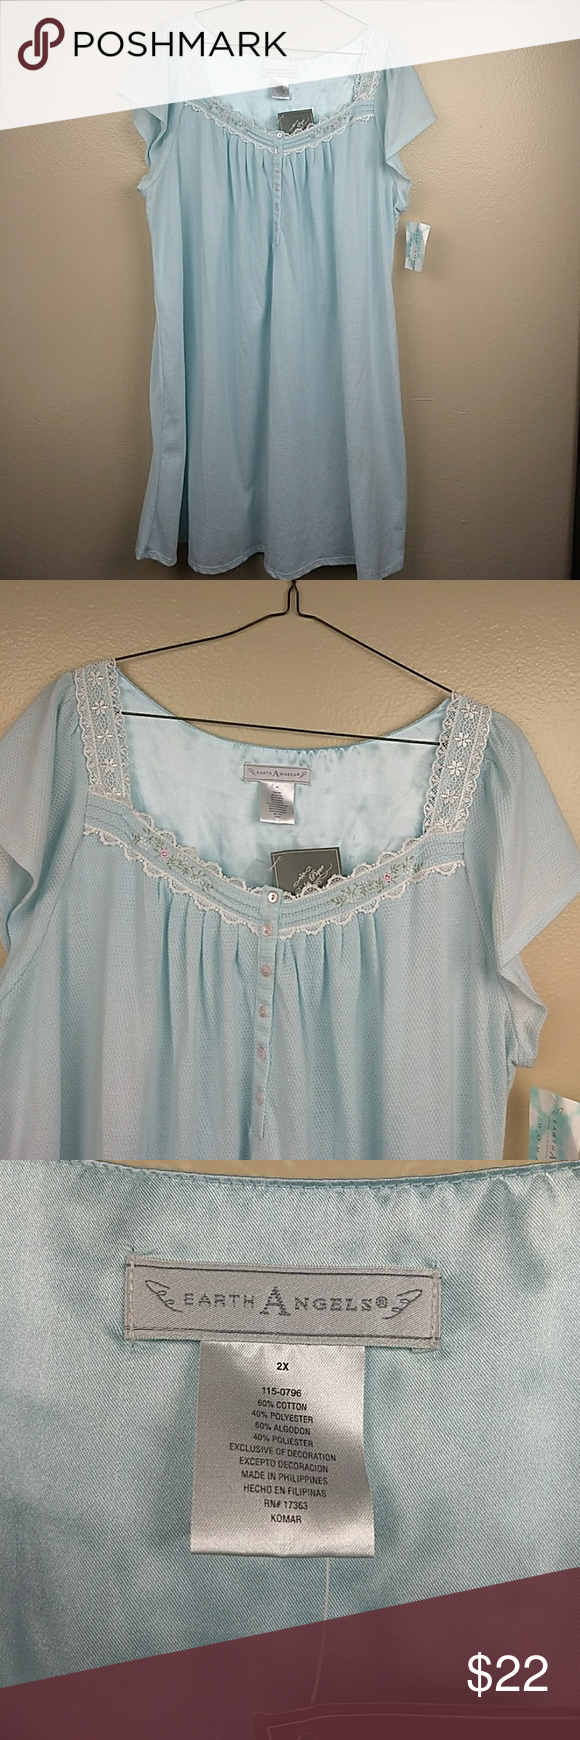 5e678267ba Earth Angel Aqua Nightgown Earth Angel Aqua Nightgown Size  2X Color   Black White